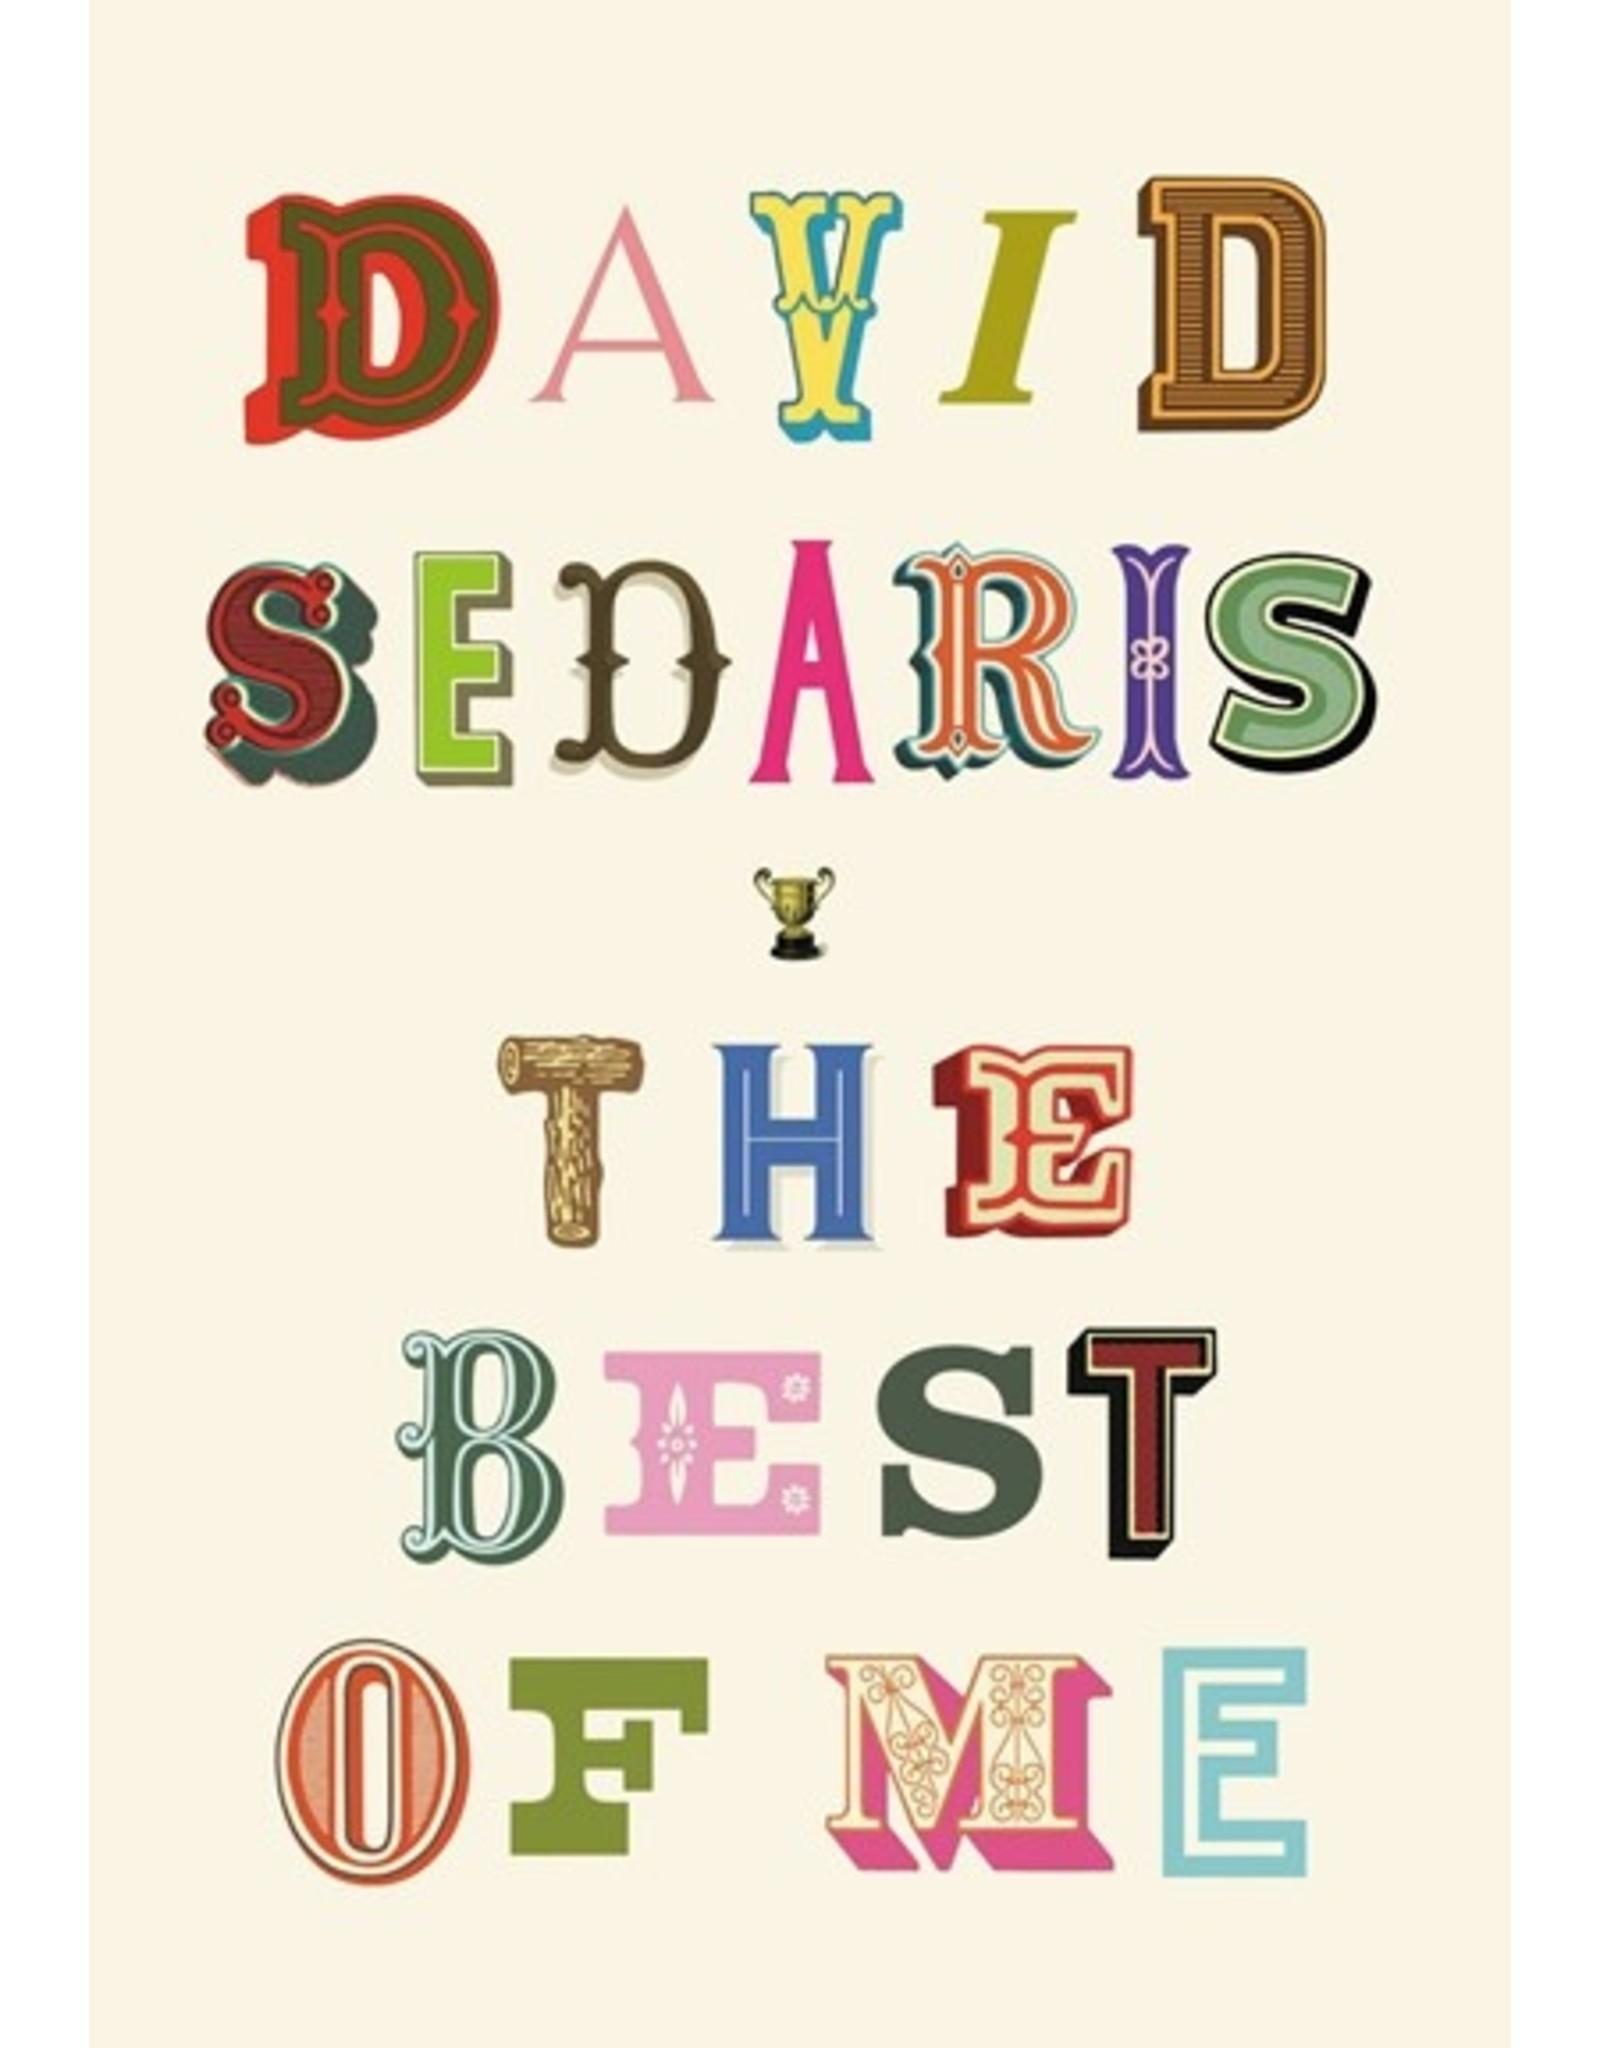 Books The Best of Me by David Sedaris